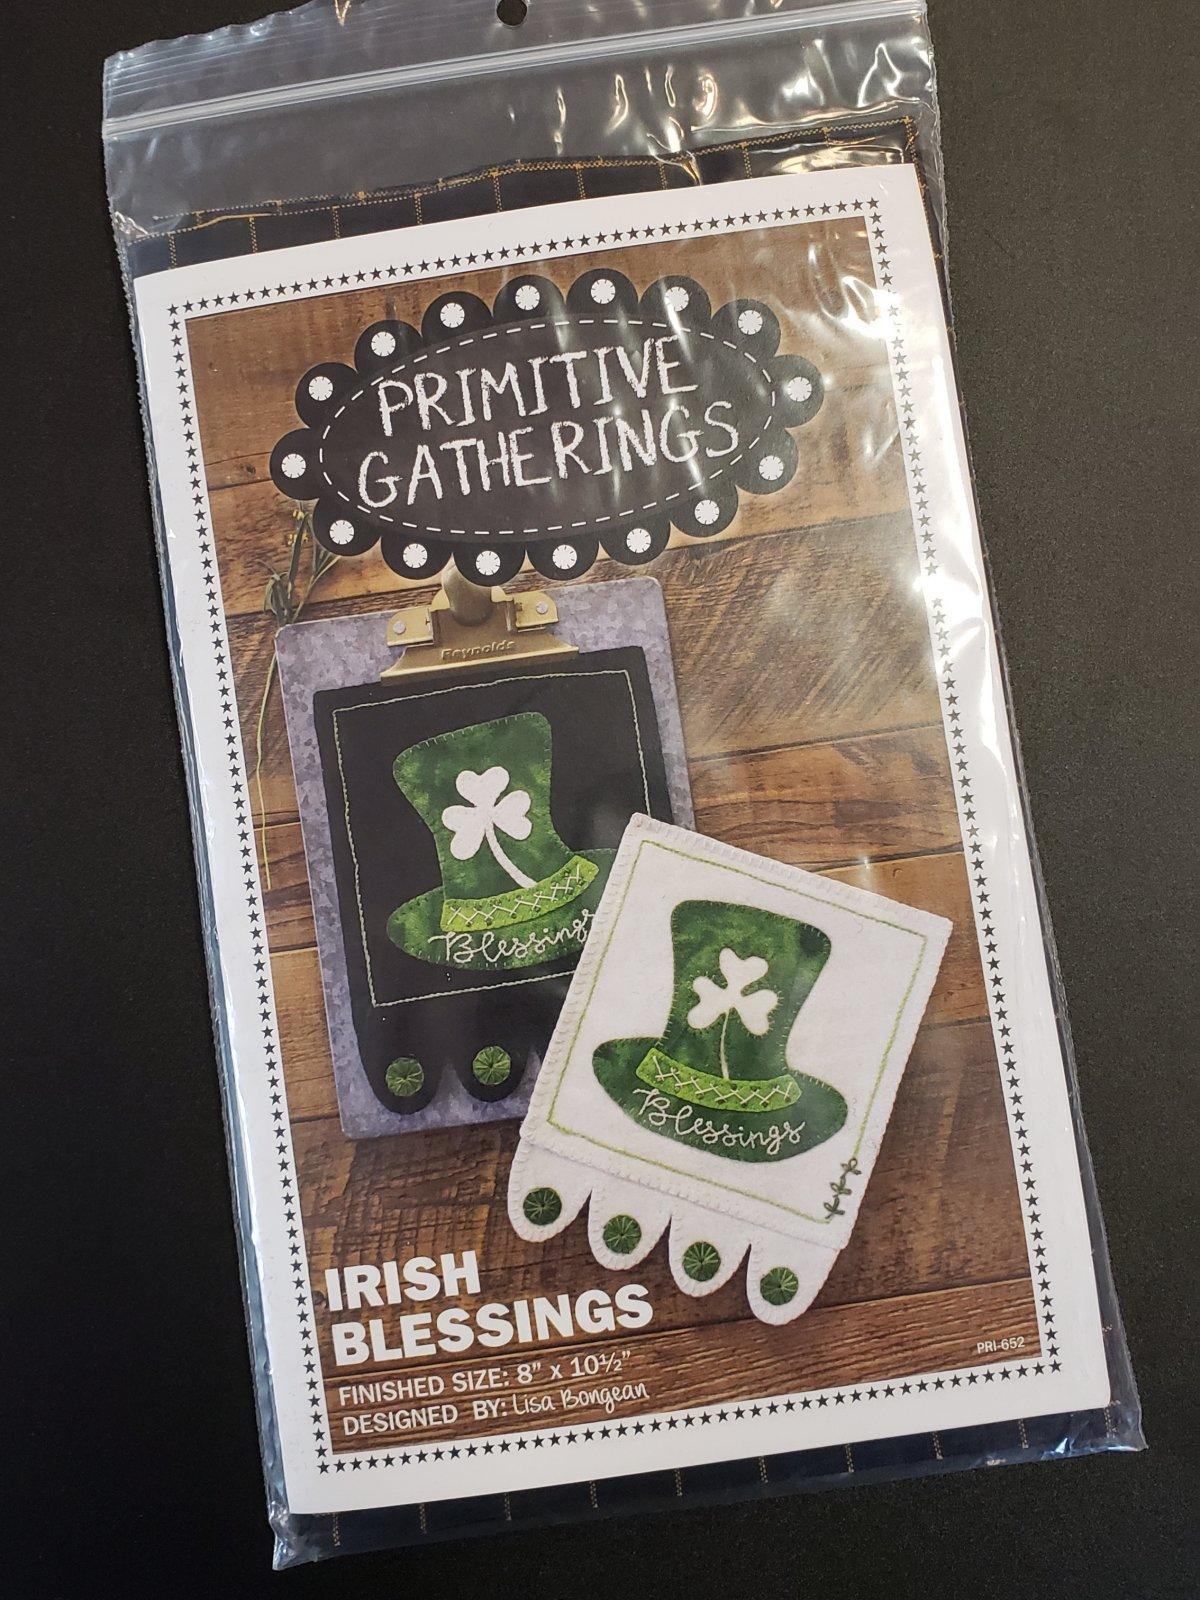 Irish Blessings Kit with Pattern - Dark Version